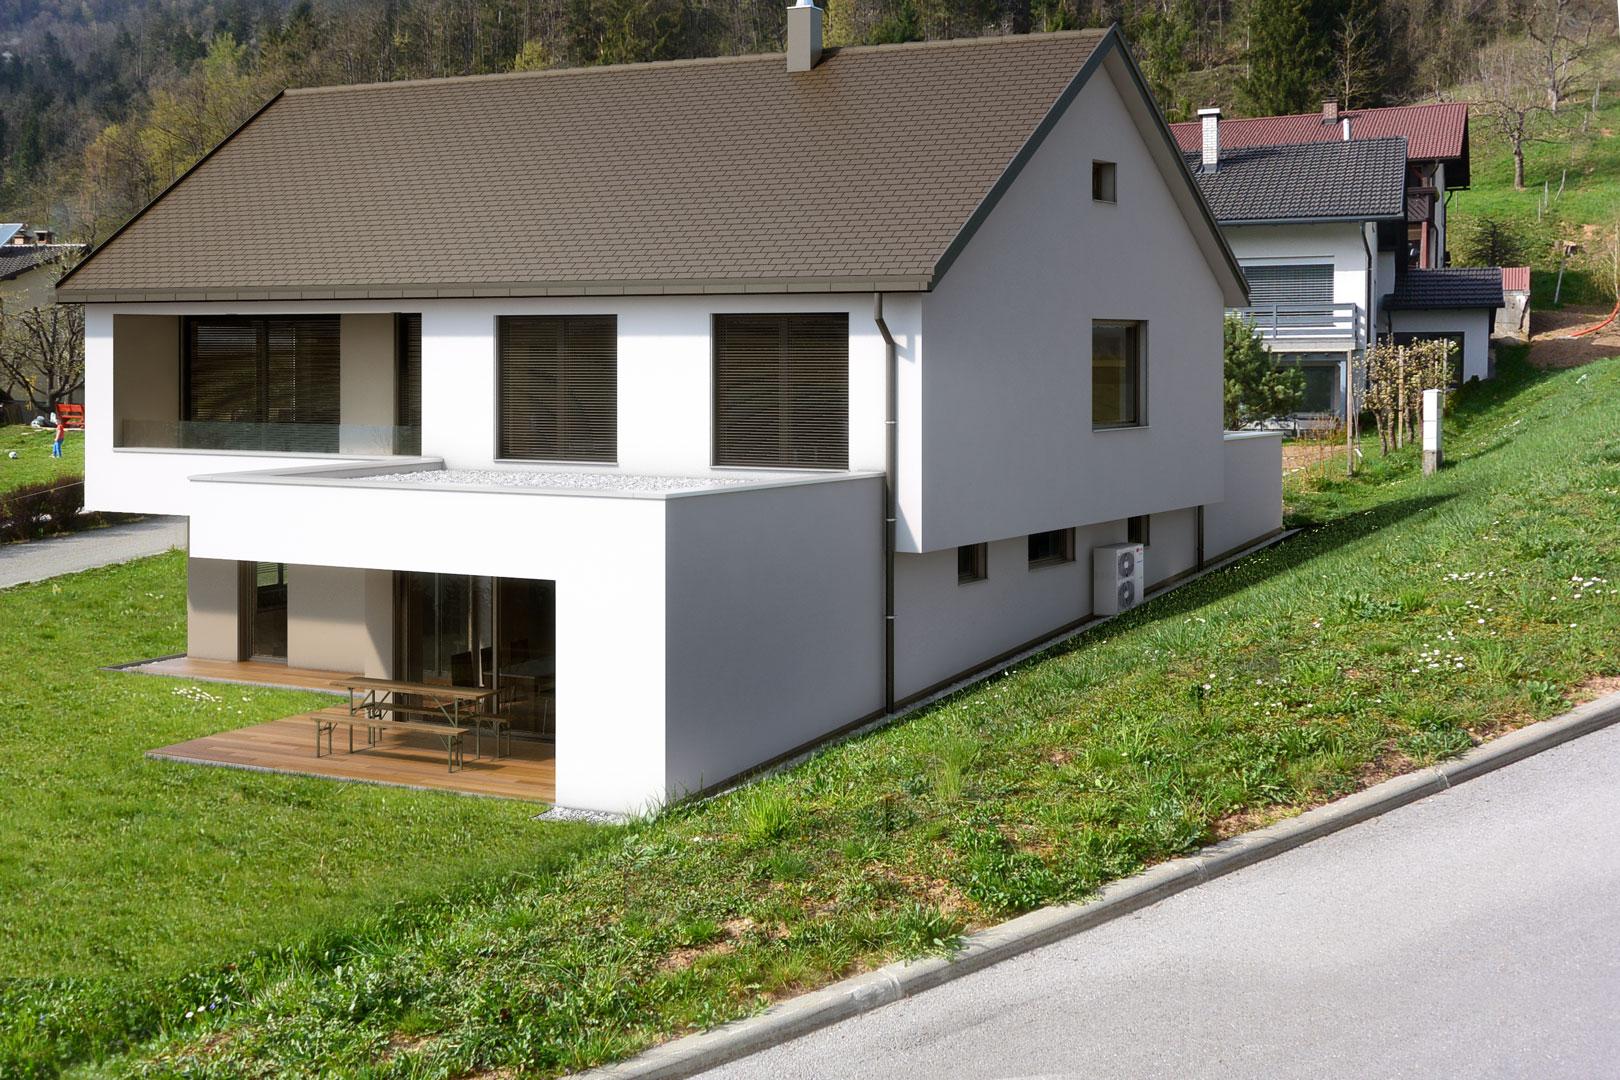 Arhitekt pasivna hiša, novogradnja